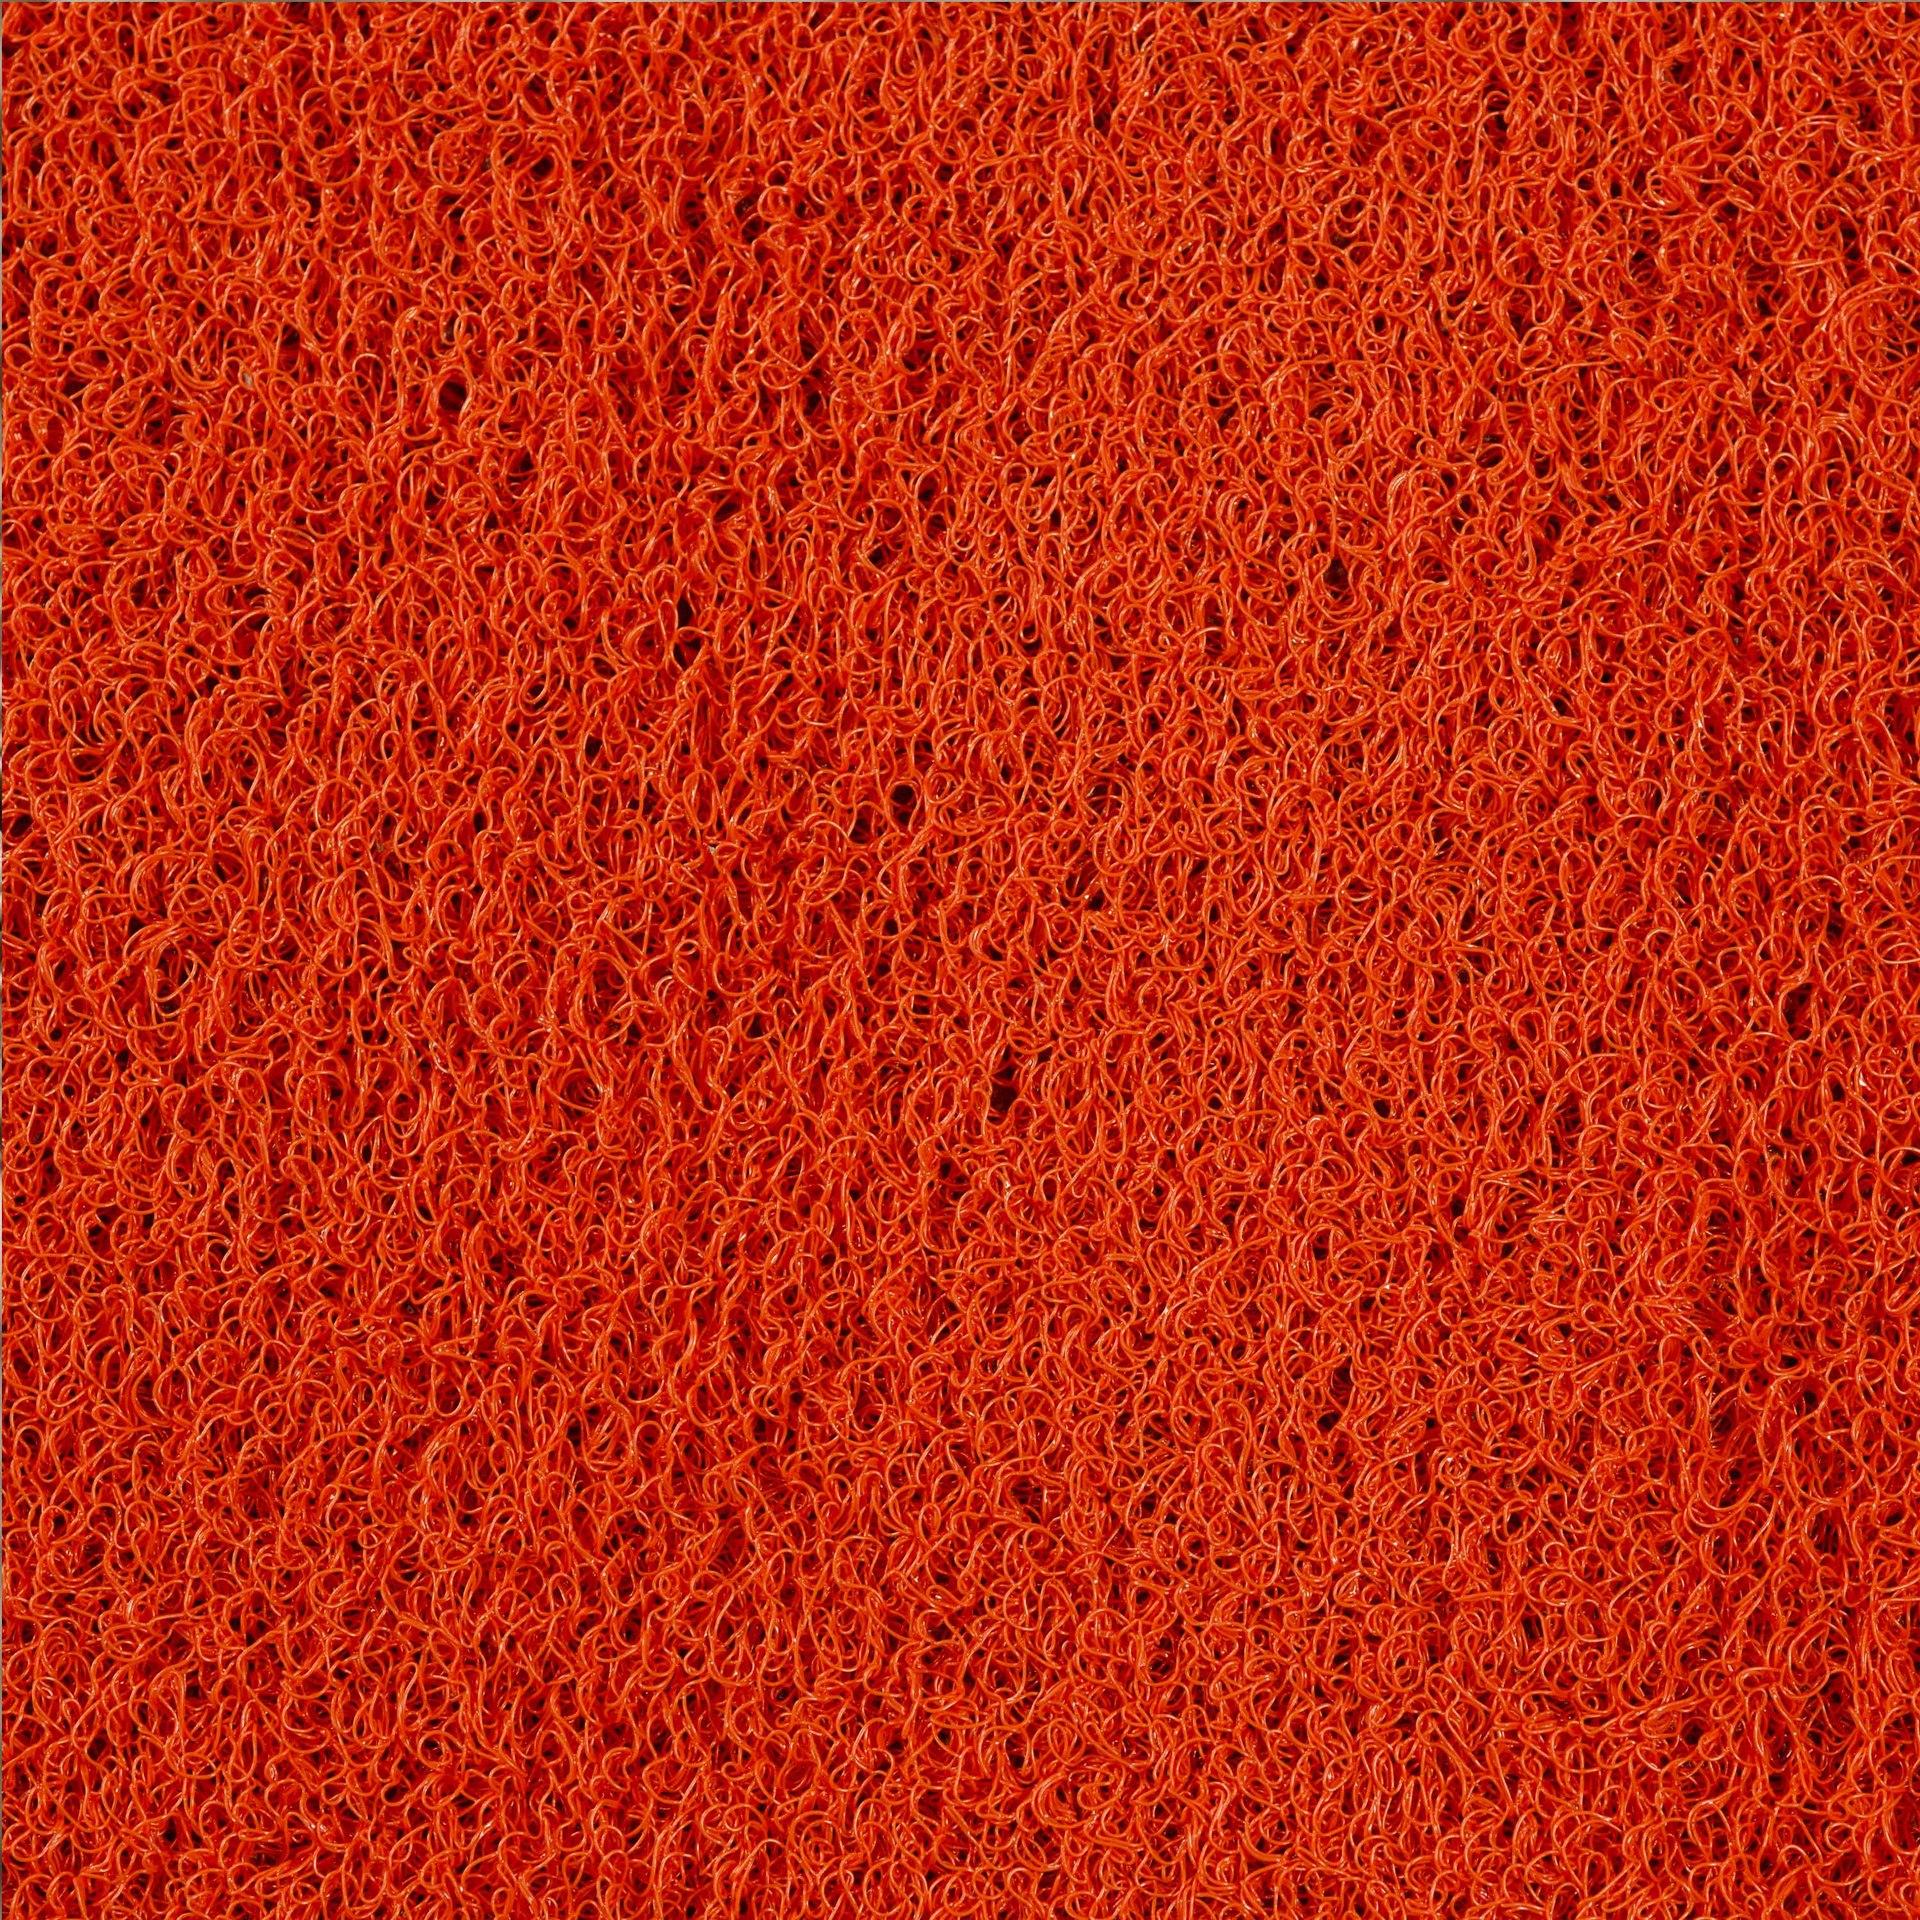 3M 朗美6850+除尘地垫红色(加工)